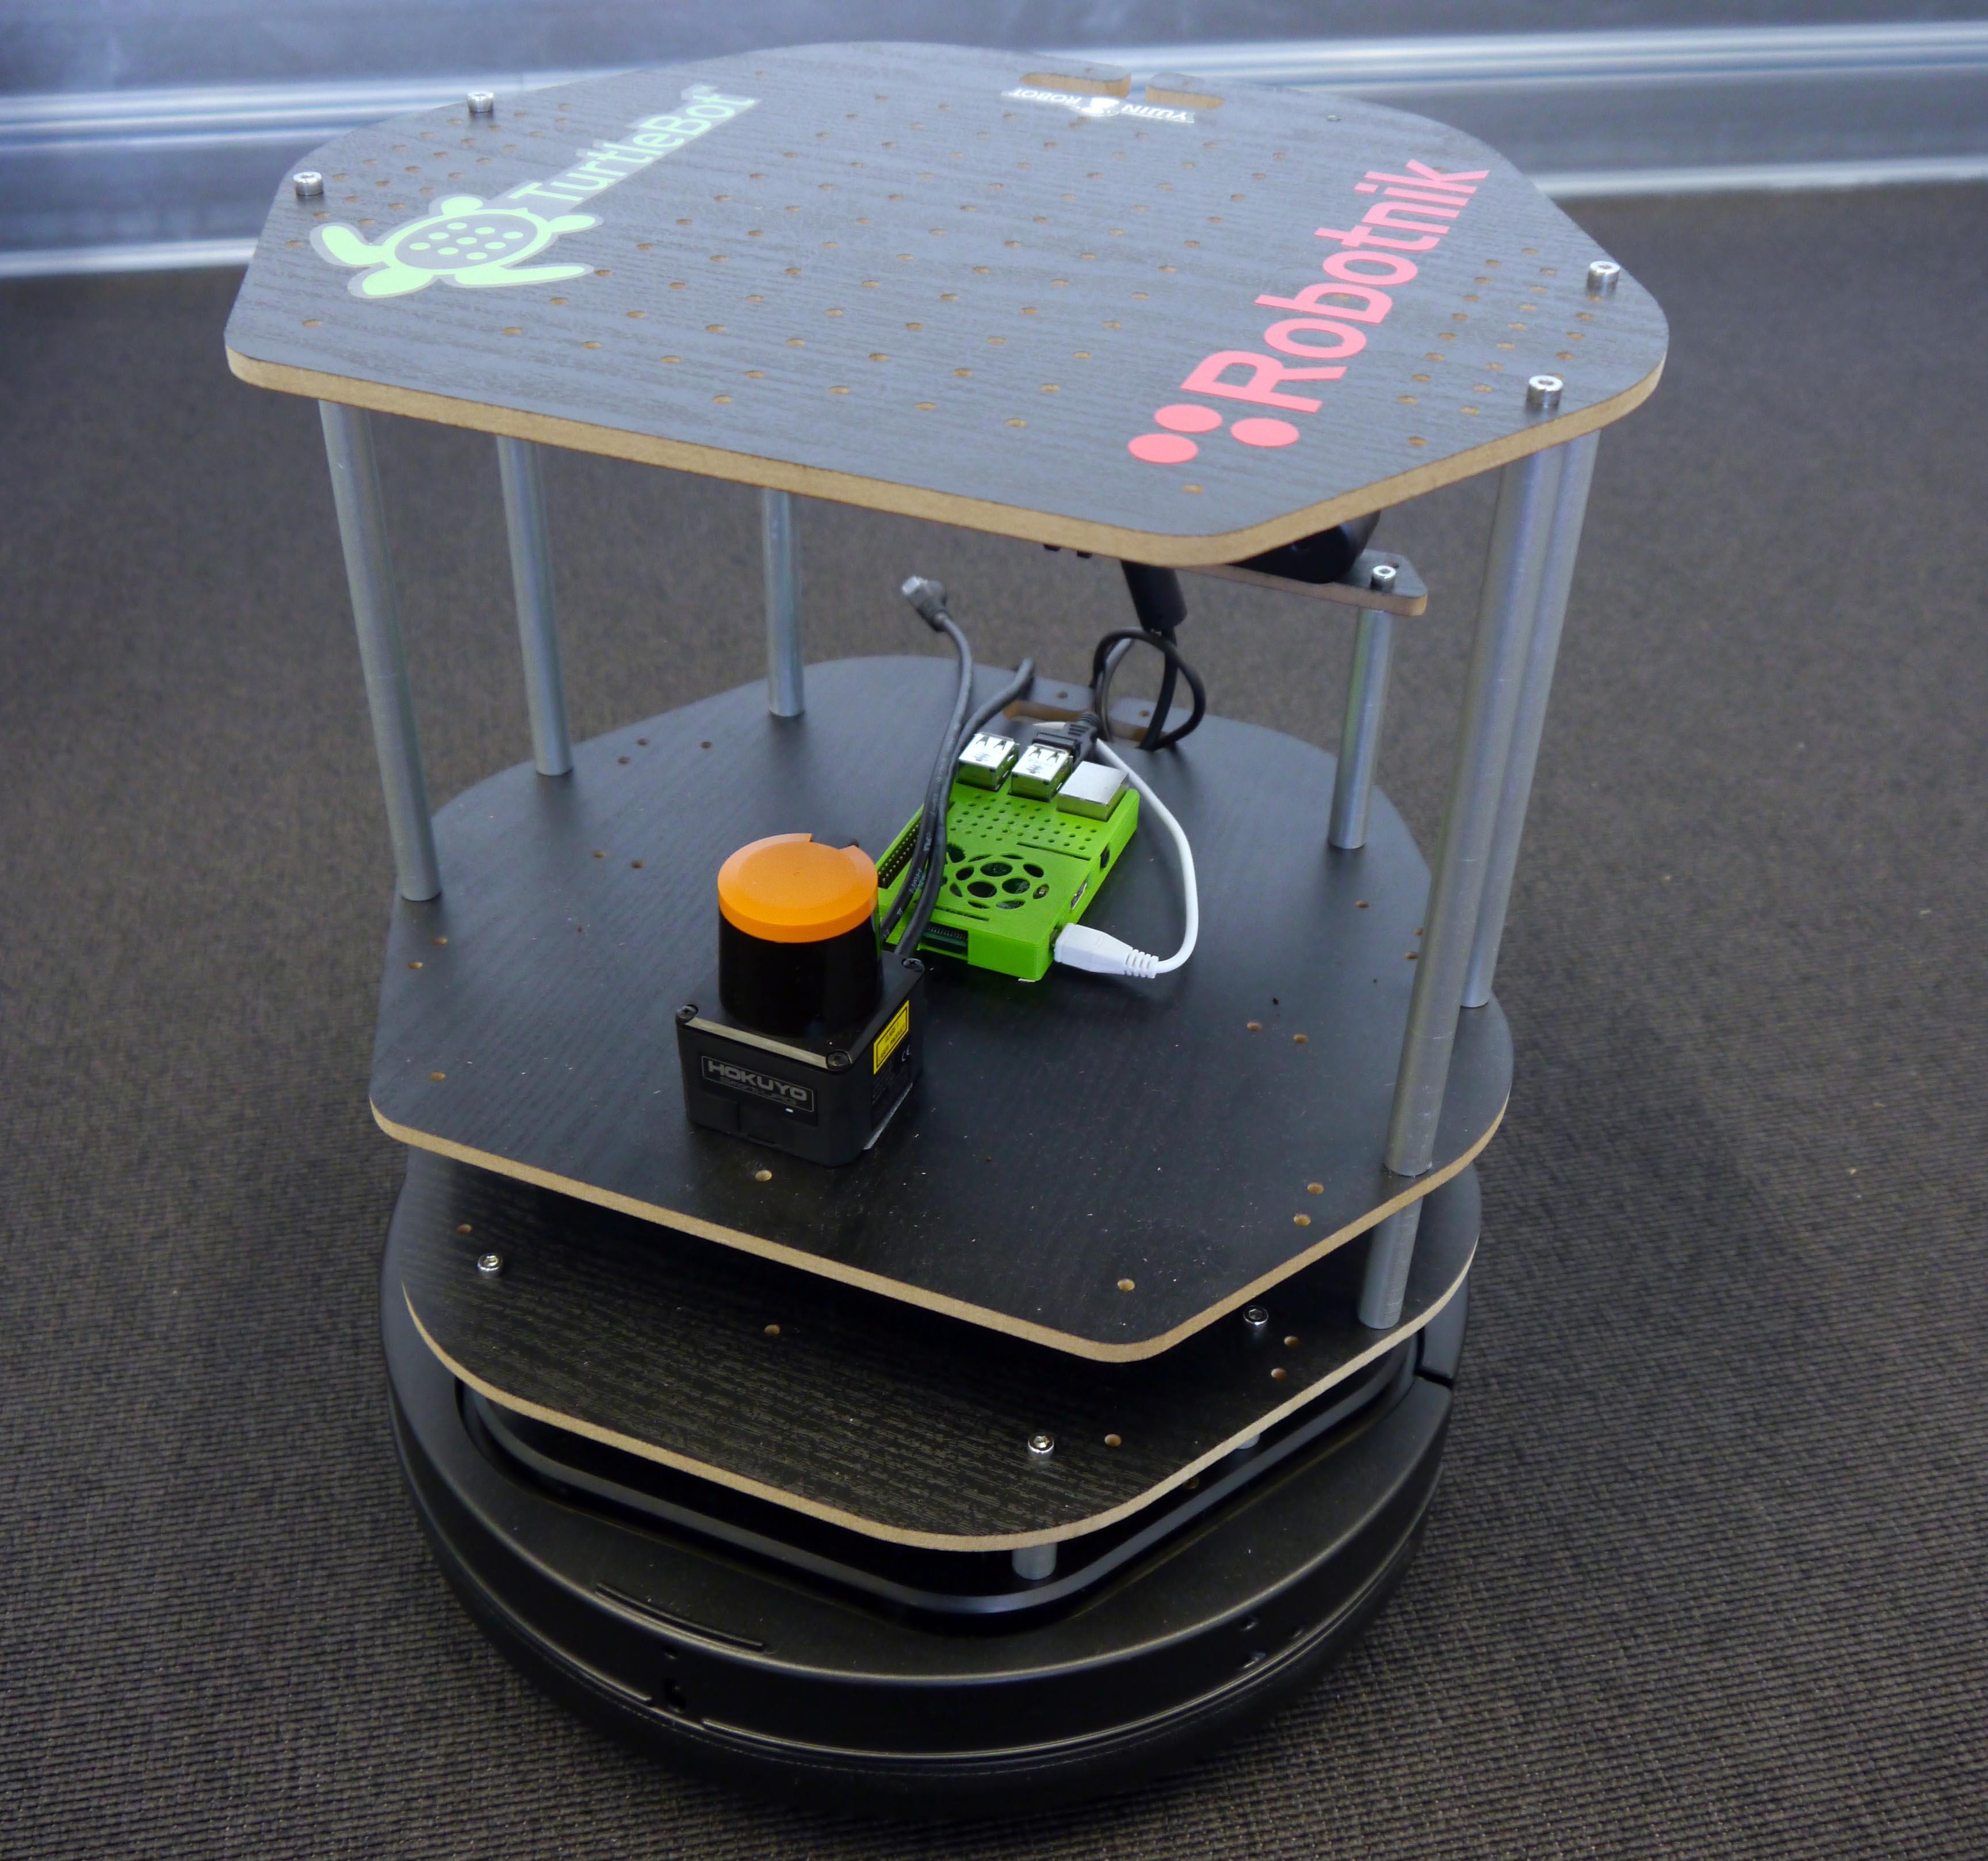 TurlteBot+Laserscanner